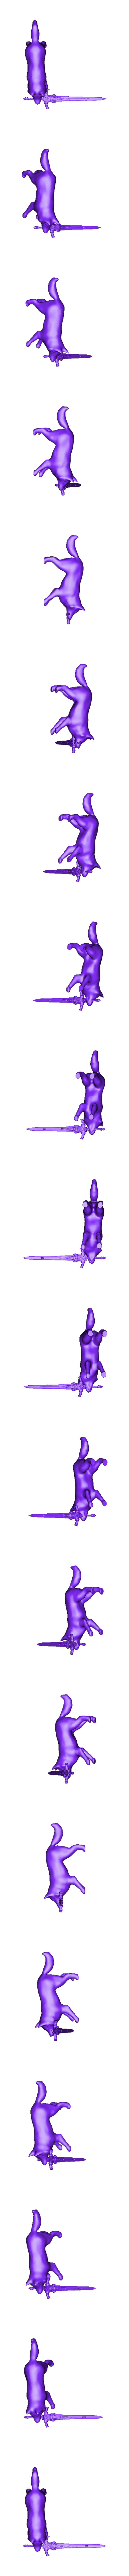 tiny sif.stl Download free STL file Tiny Sif - Dark Souls • 3D printable model, skelei